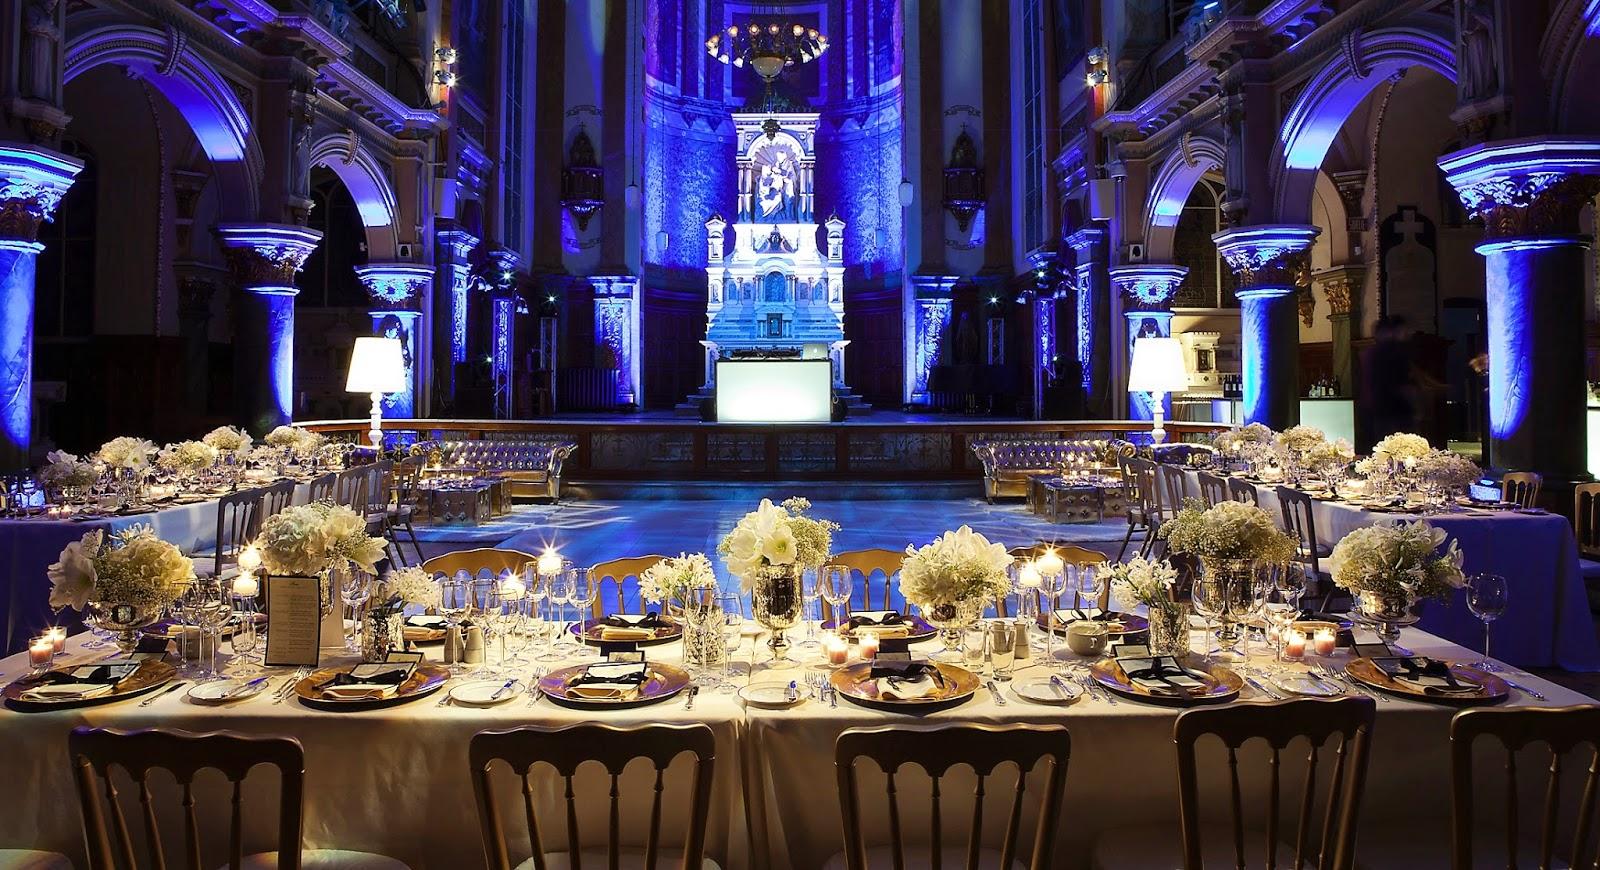 Luxury Wedding Venues: Luxury Wedding Themes